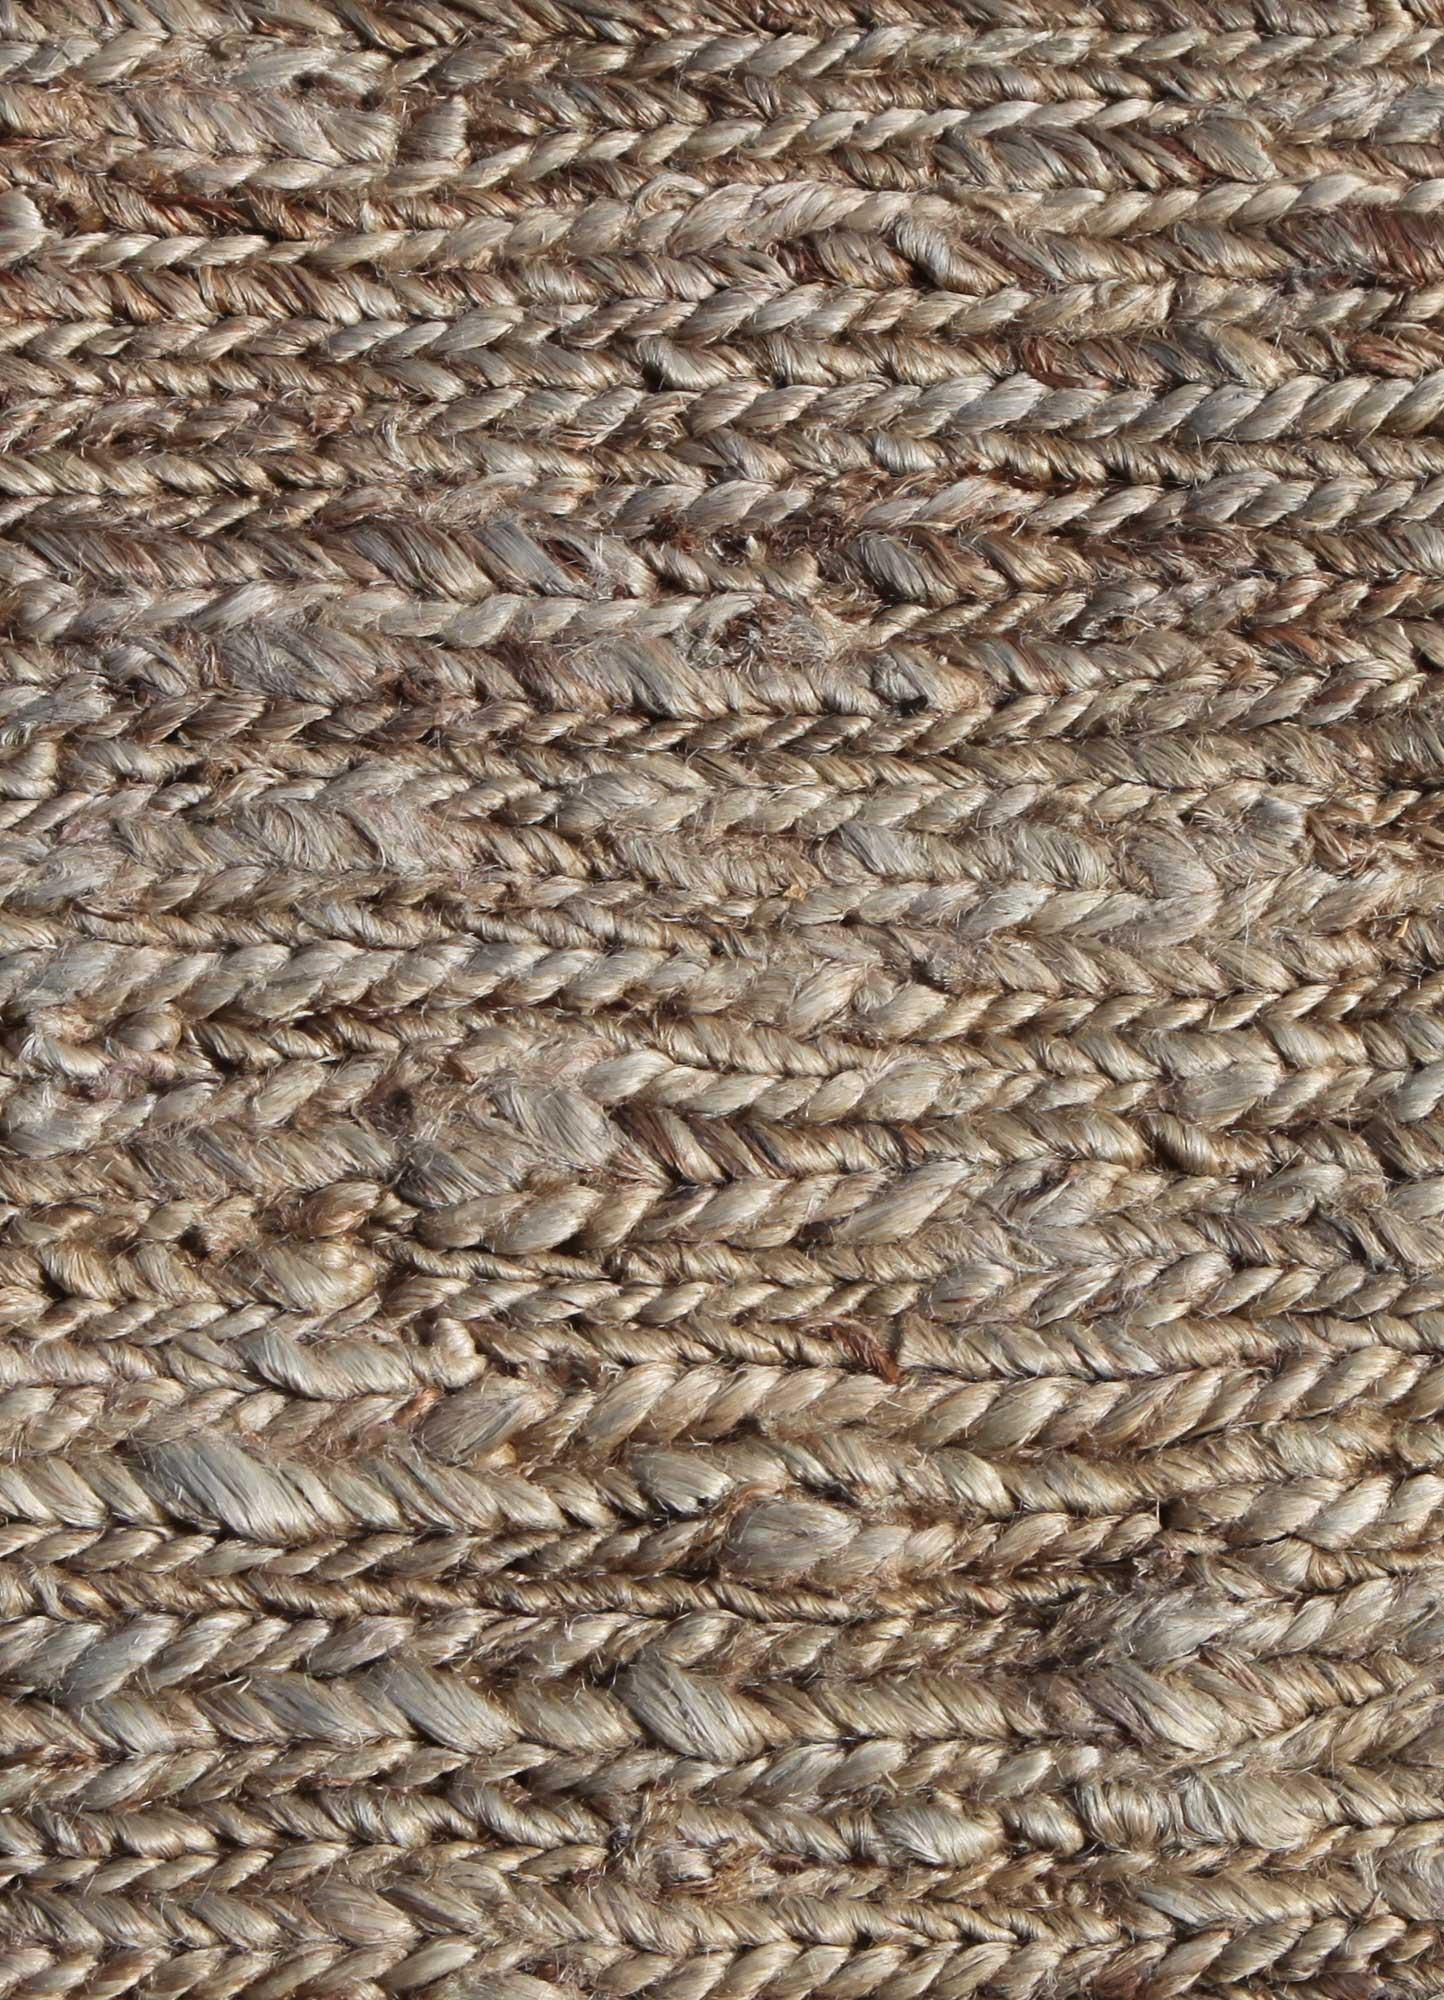 abrash grey and black jute and hemp flat weaves Rug - CloseUp